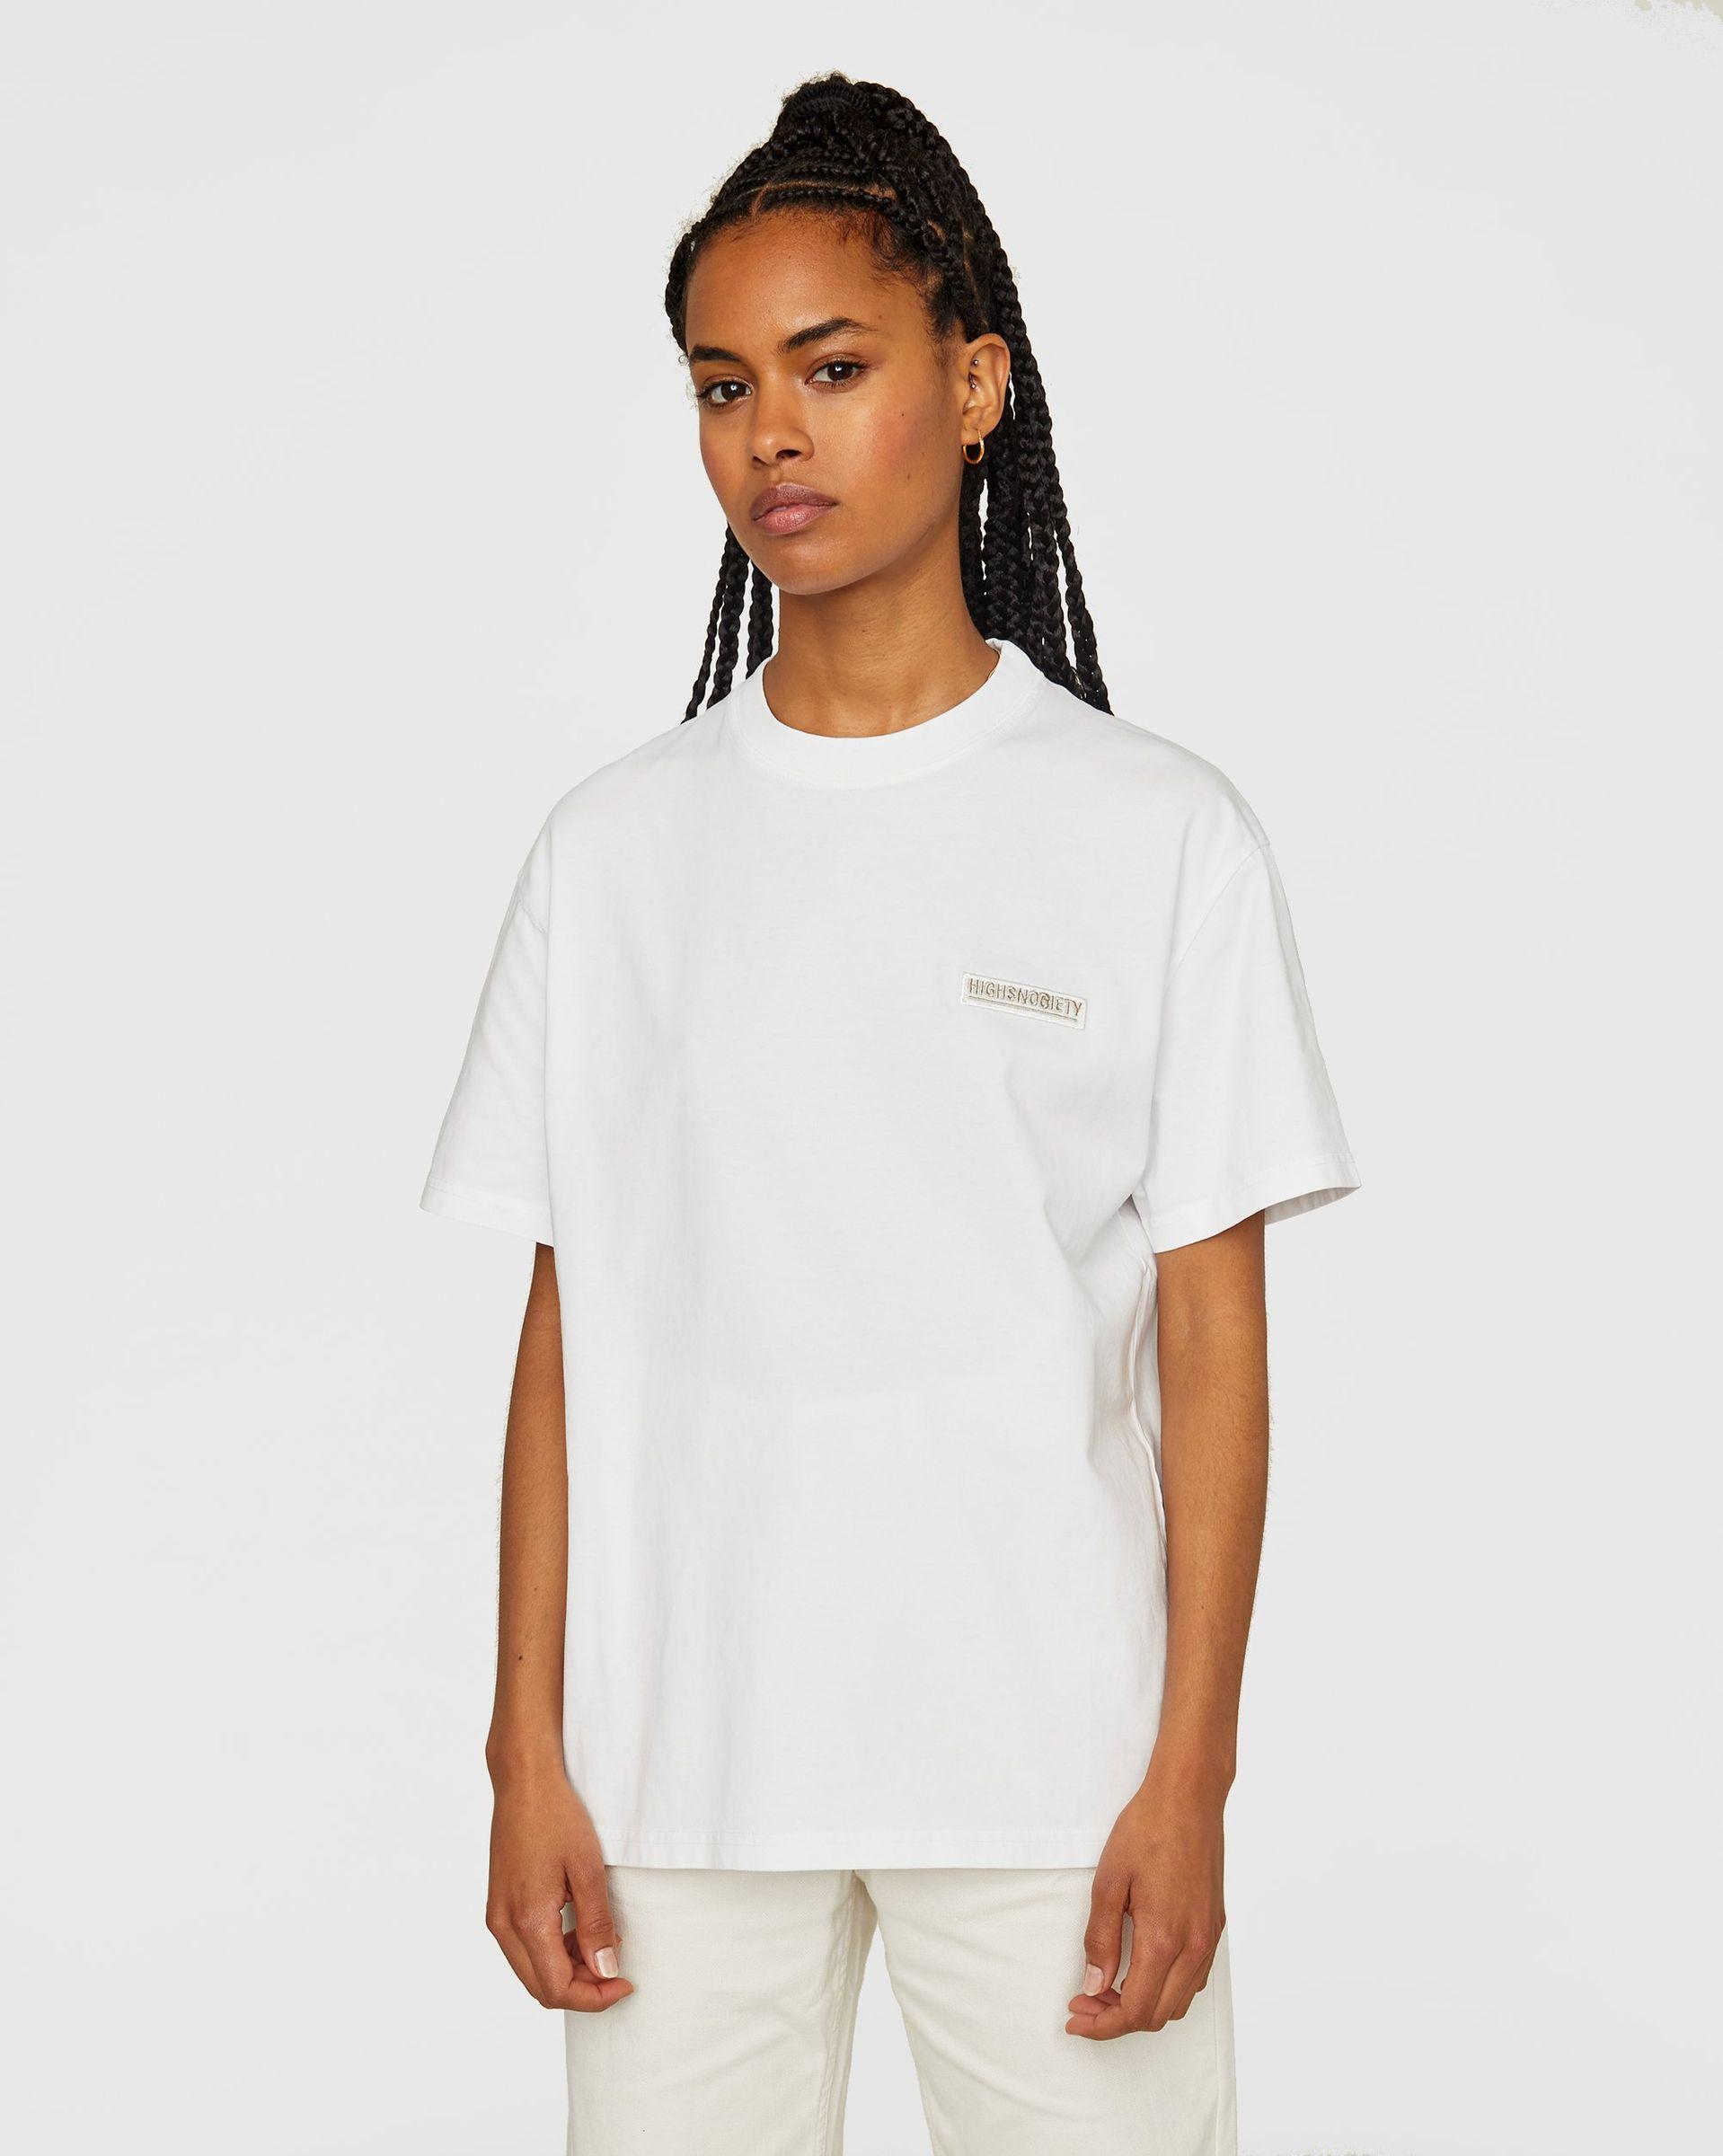 Highsnobiety Staples - T-Shirt White - Image 5